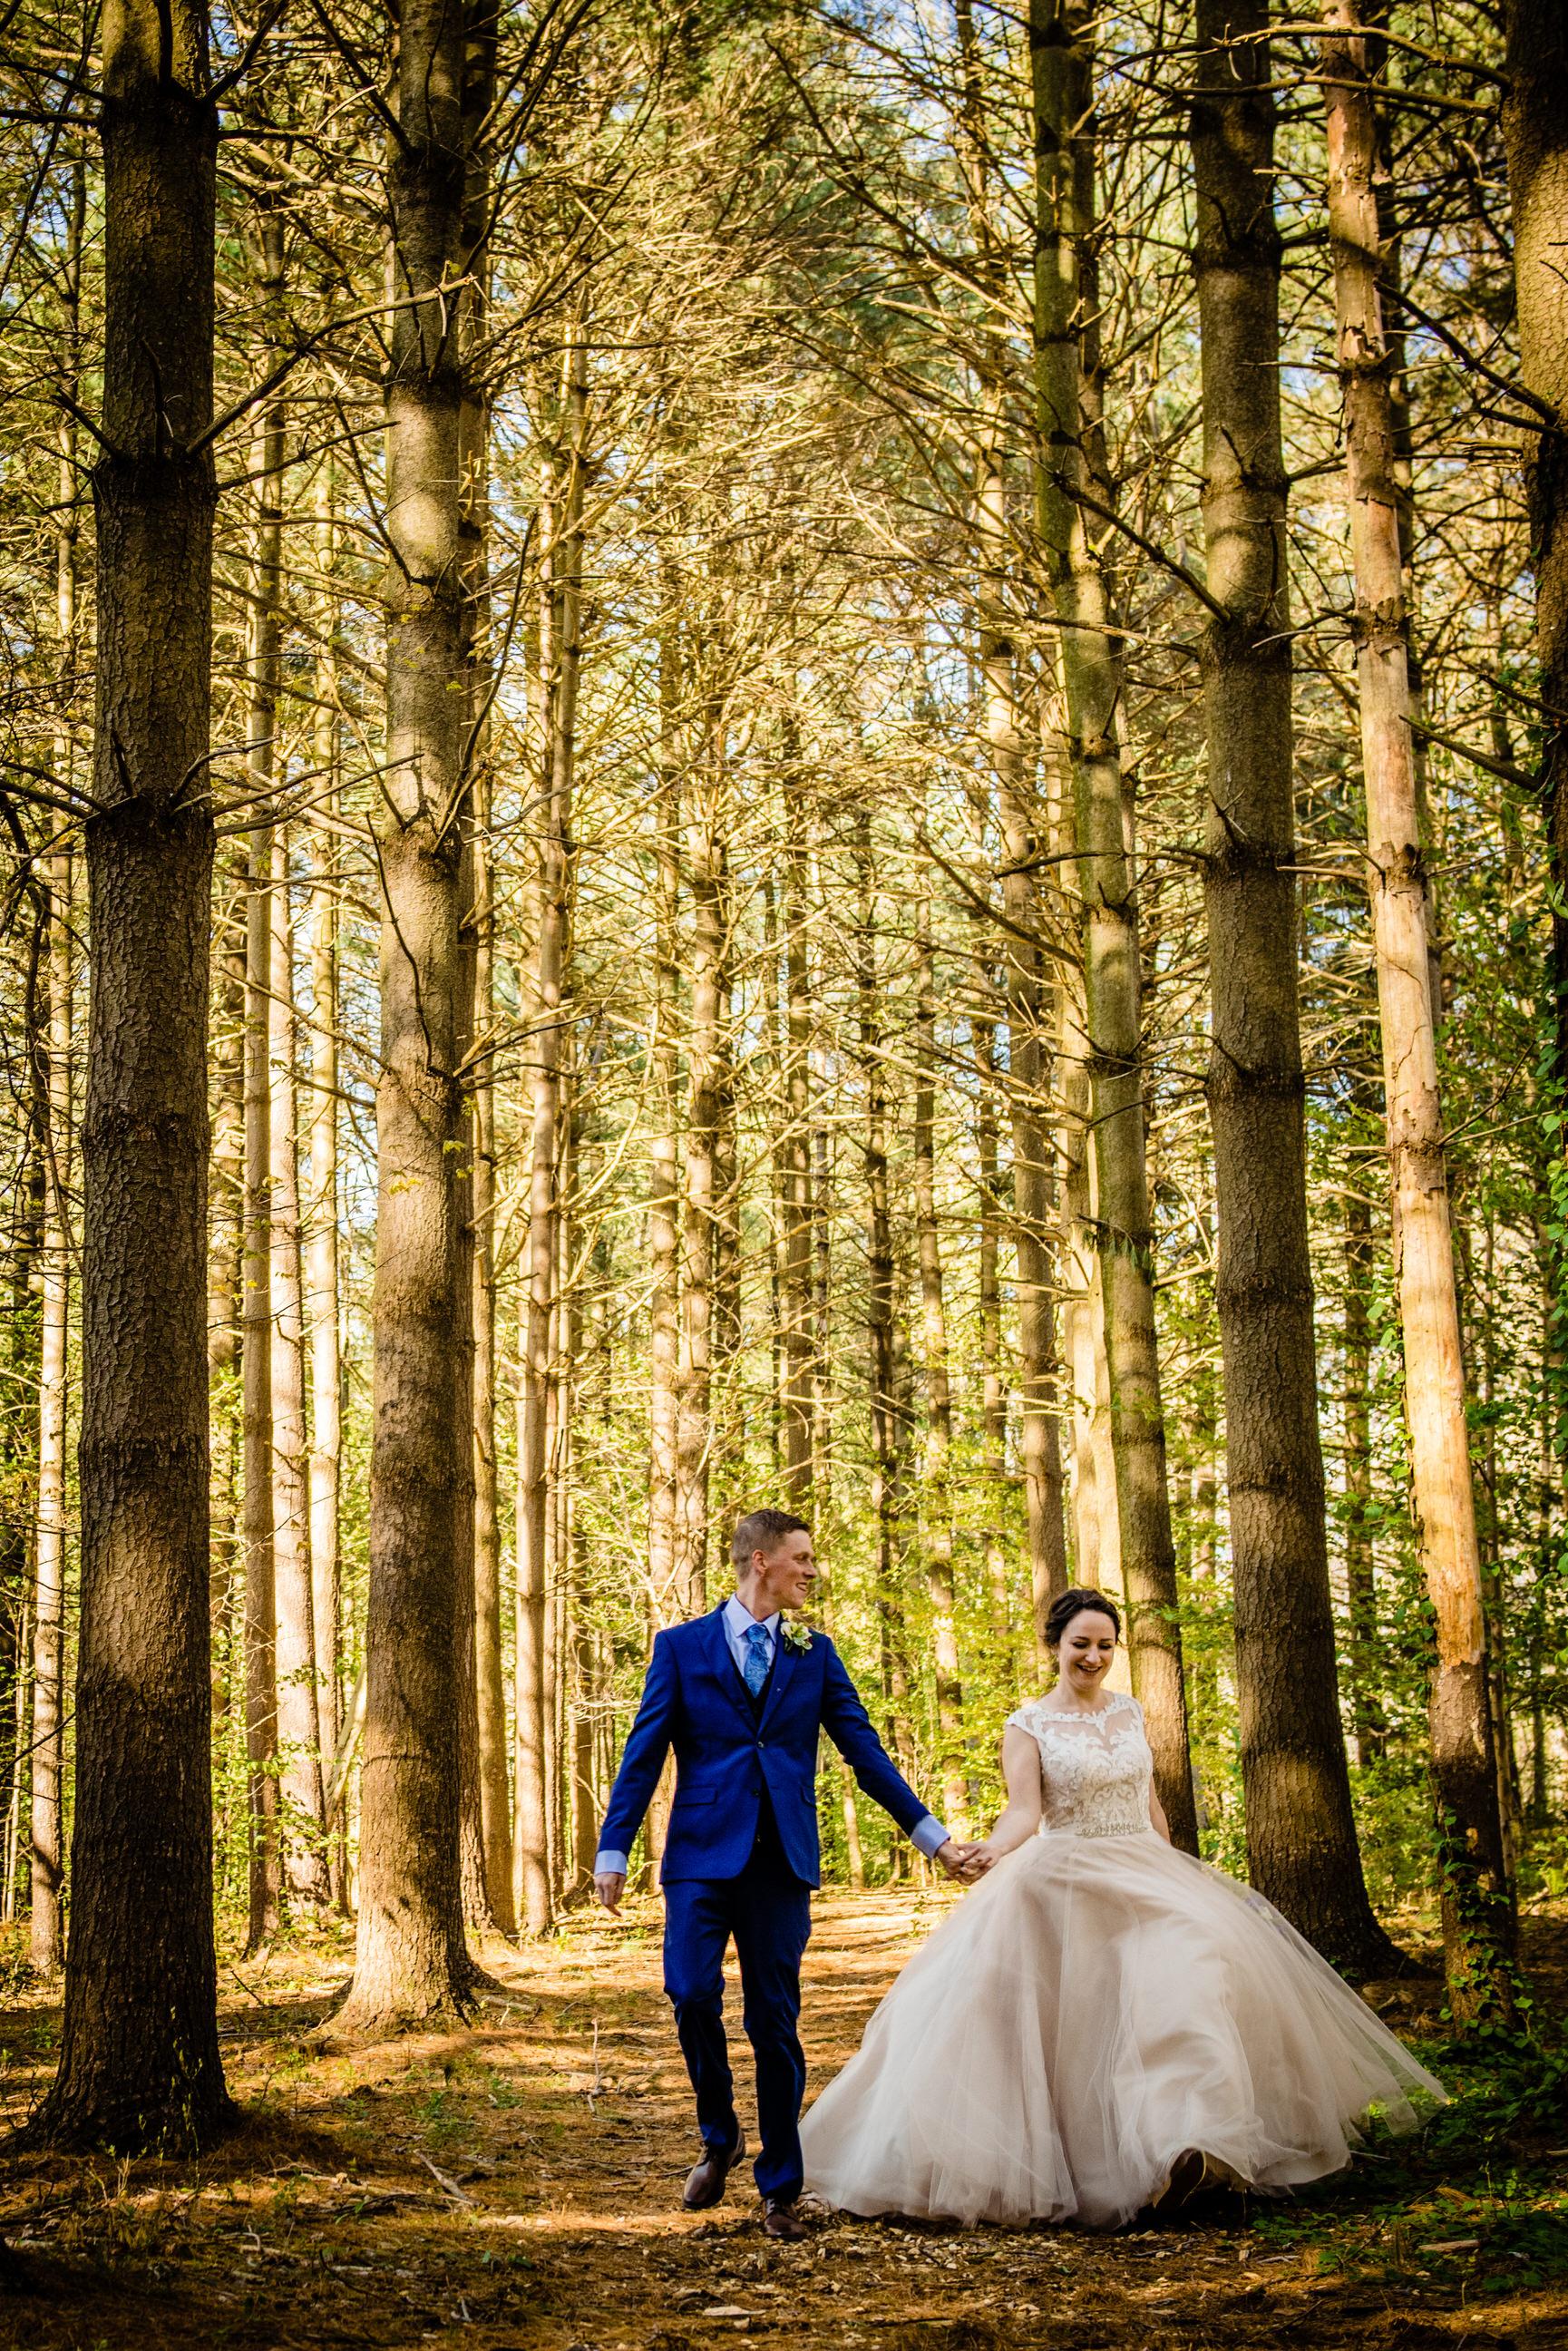 ThorpewoodWedding-Eileen&Chris-5947.jpg